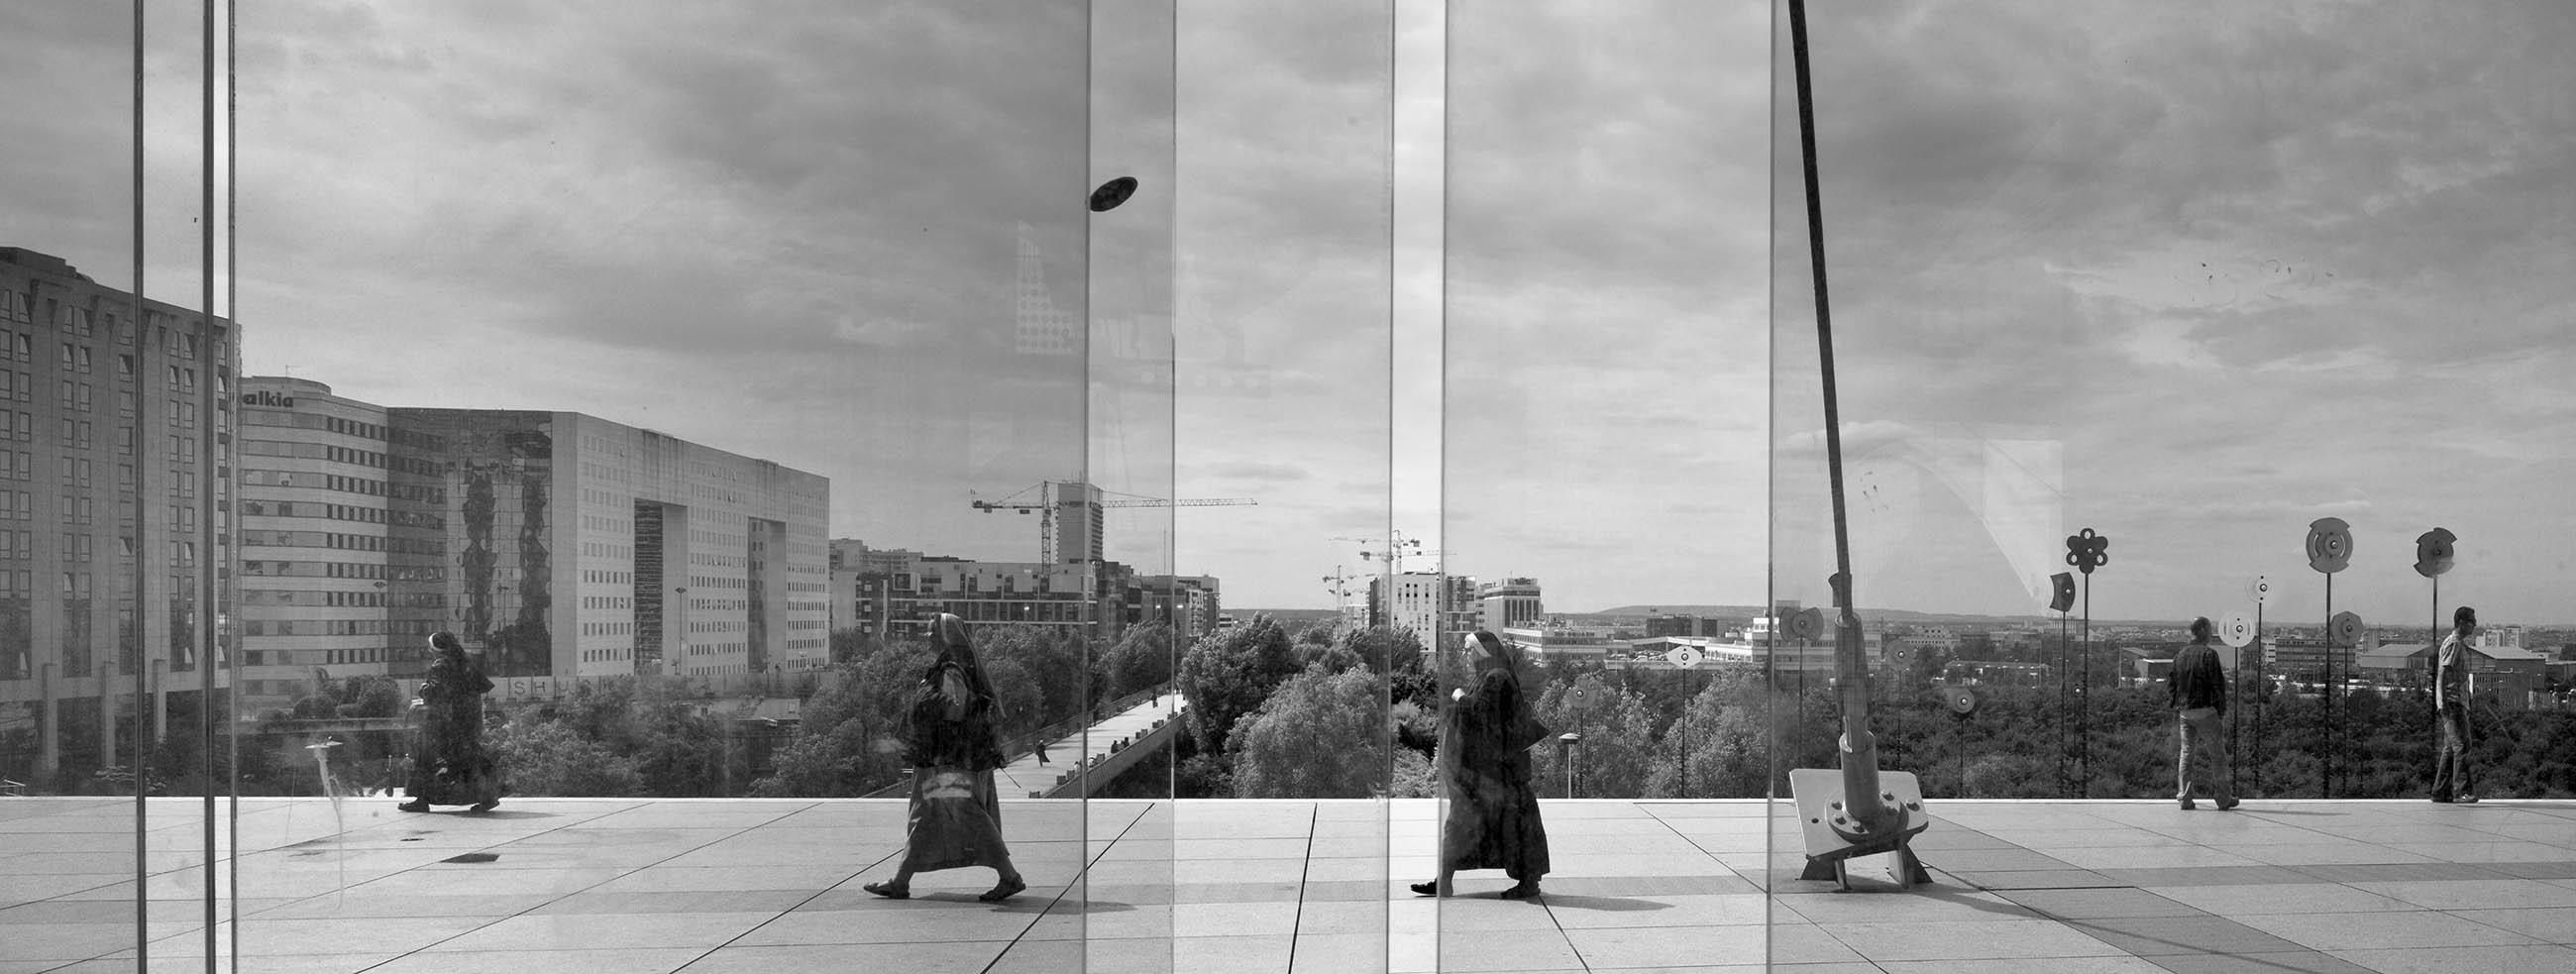 Architectural Photography, La Défense, Paris by Andrew Butler - Exeter, Devon